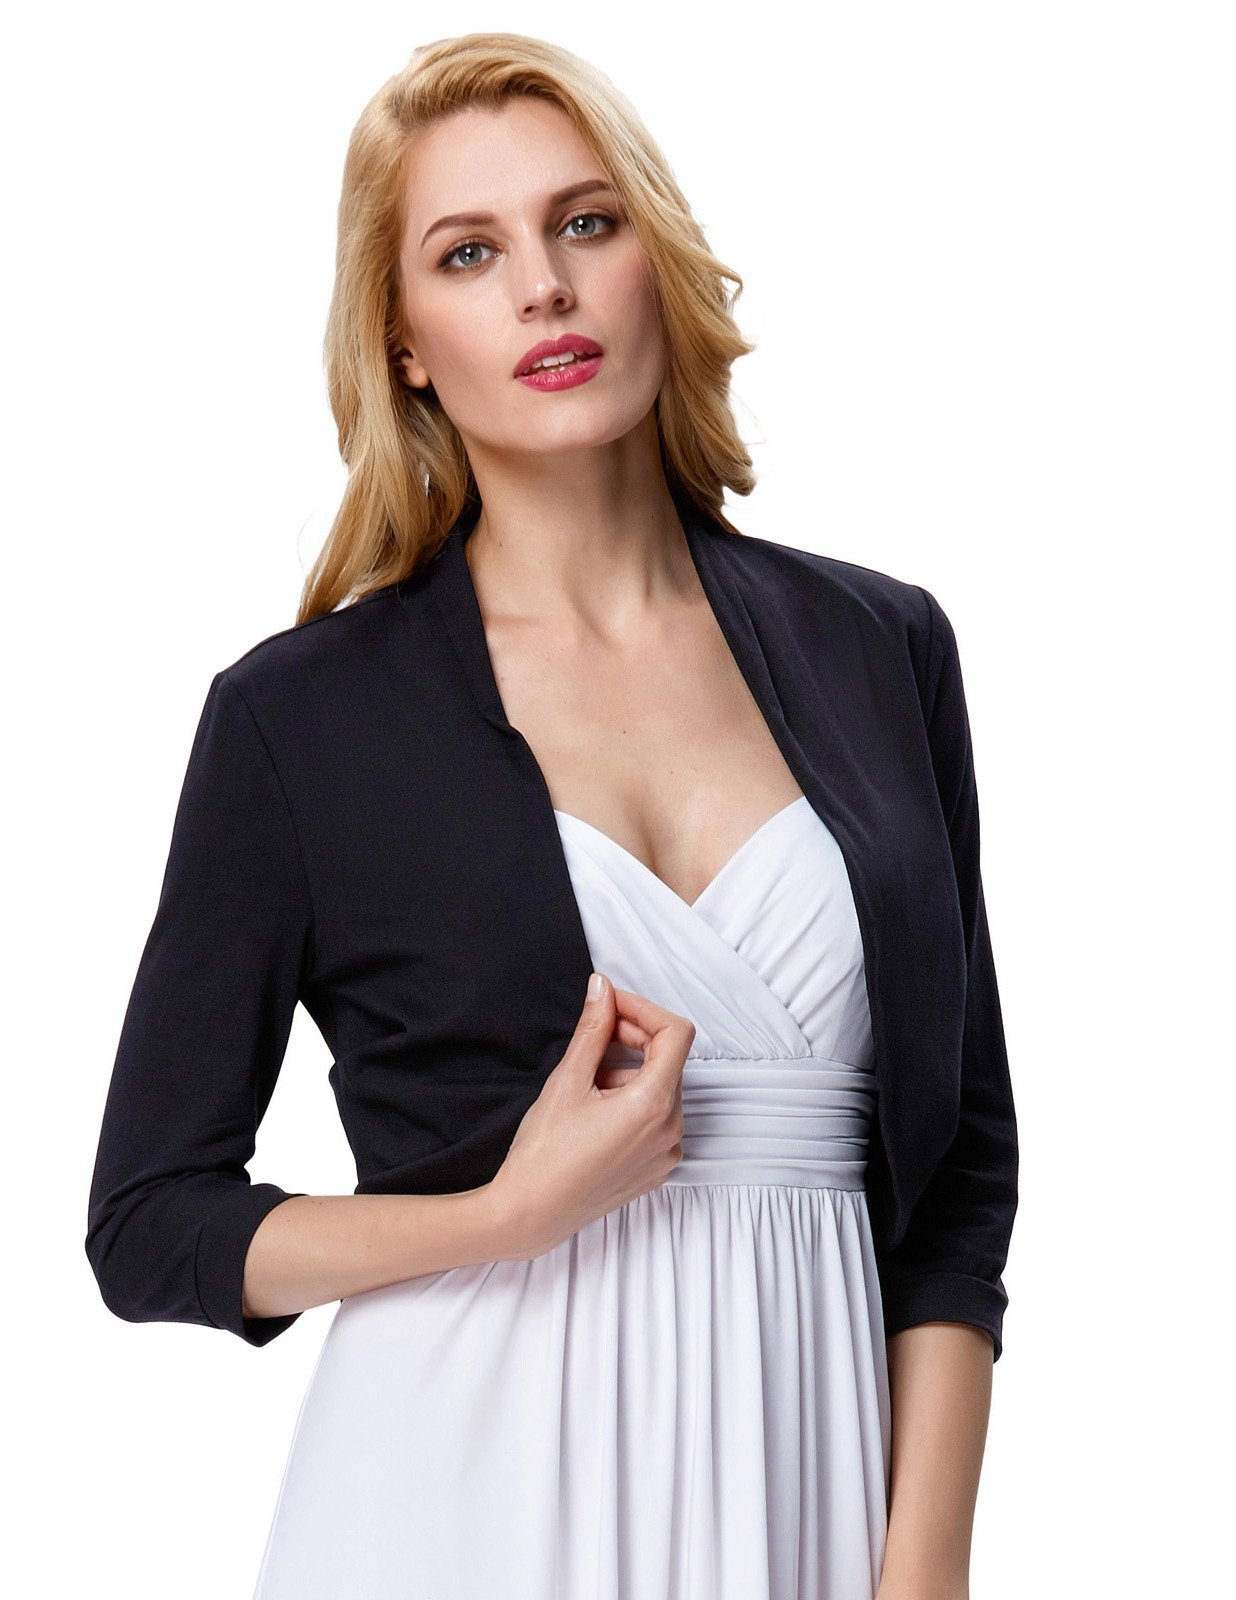 Spring Black Cropped Wedding Bolero Jacket Plain(XL, Black 512-1) by JS Fashion Vintage Dress (Image #4)